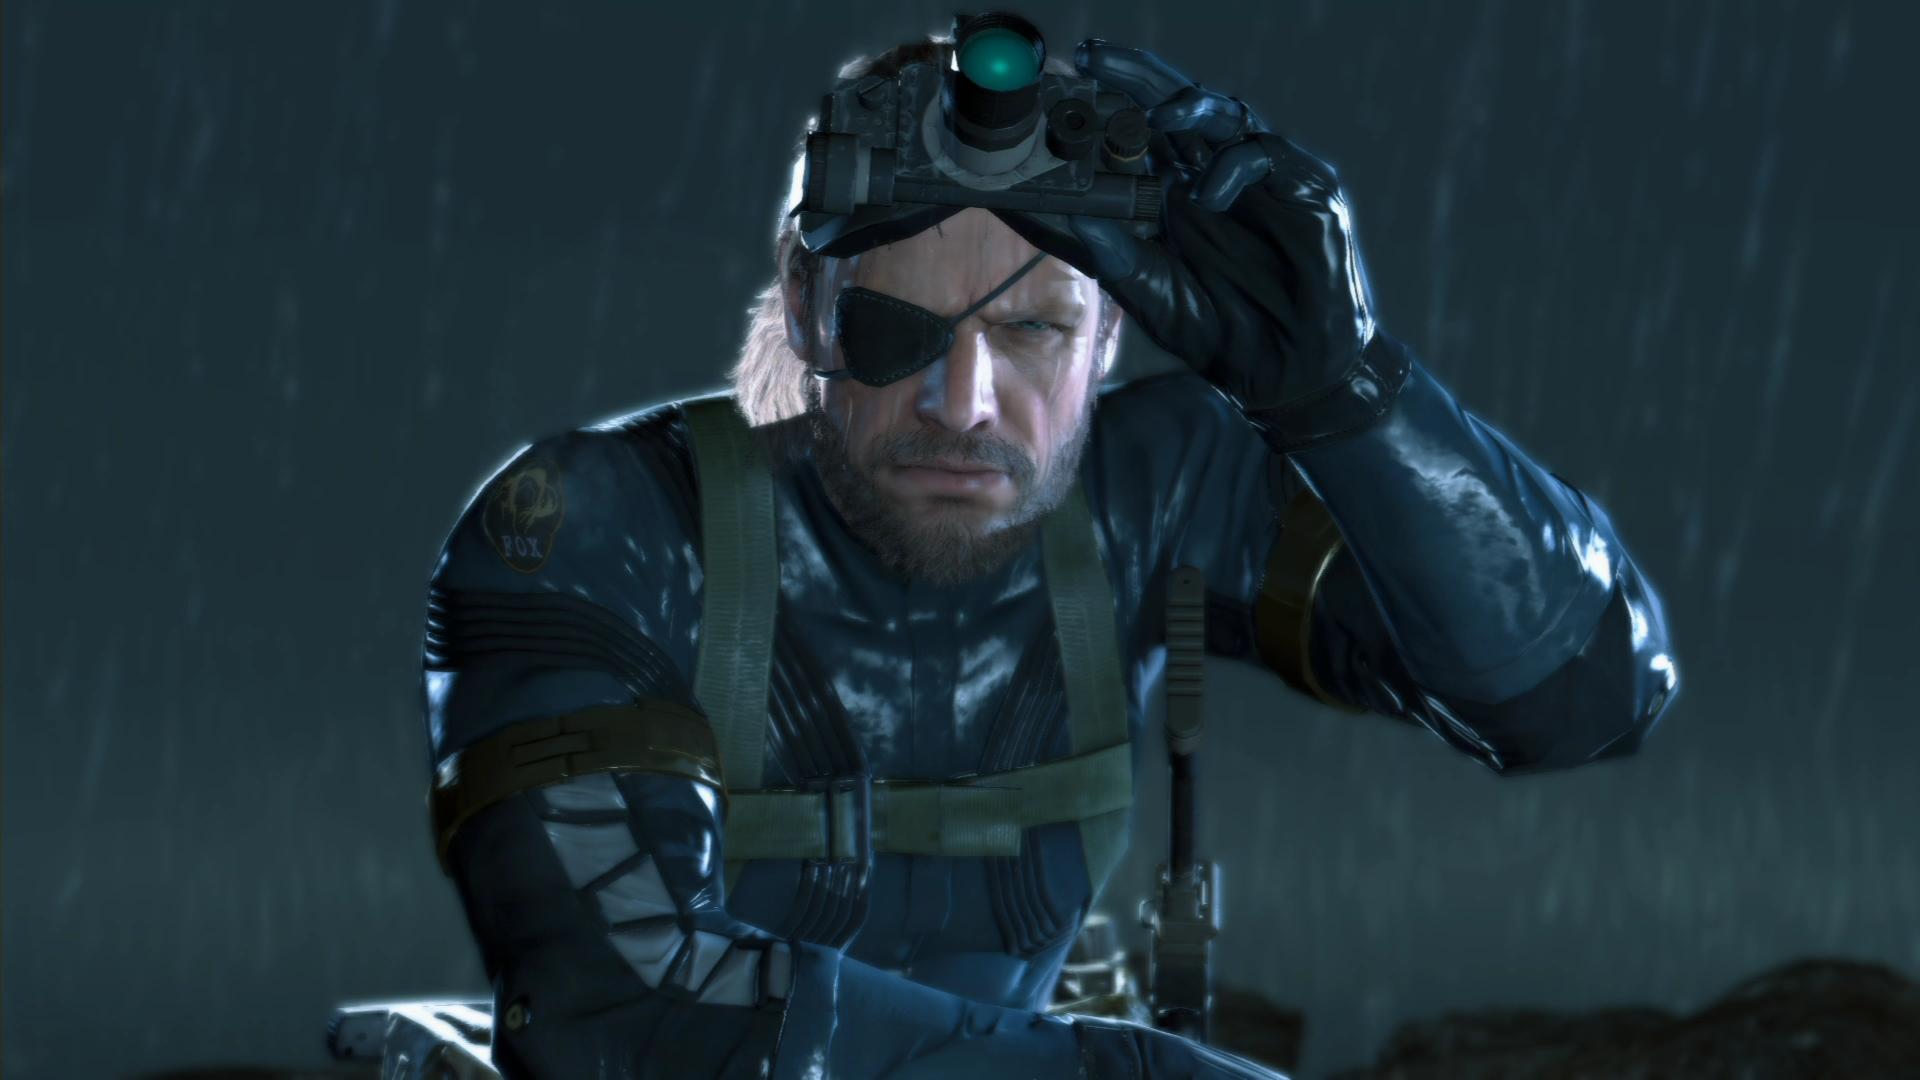 Boss spots a Metal Gear performing a tactical strike on Konami servers.